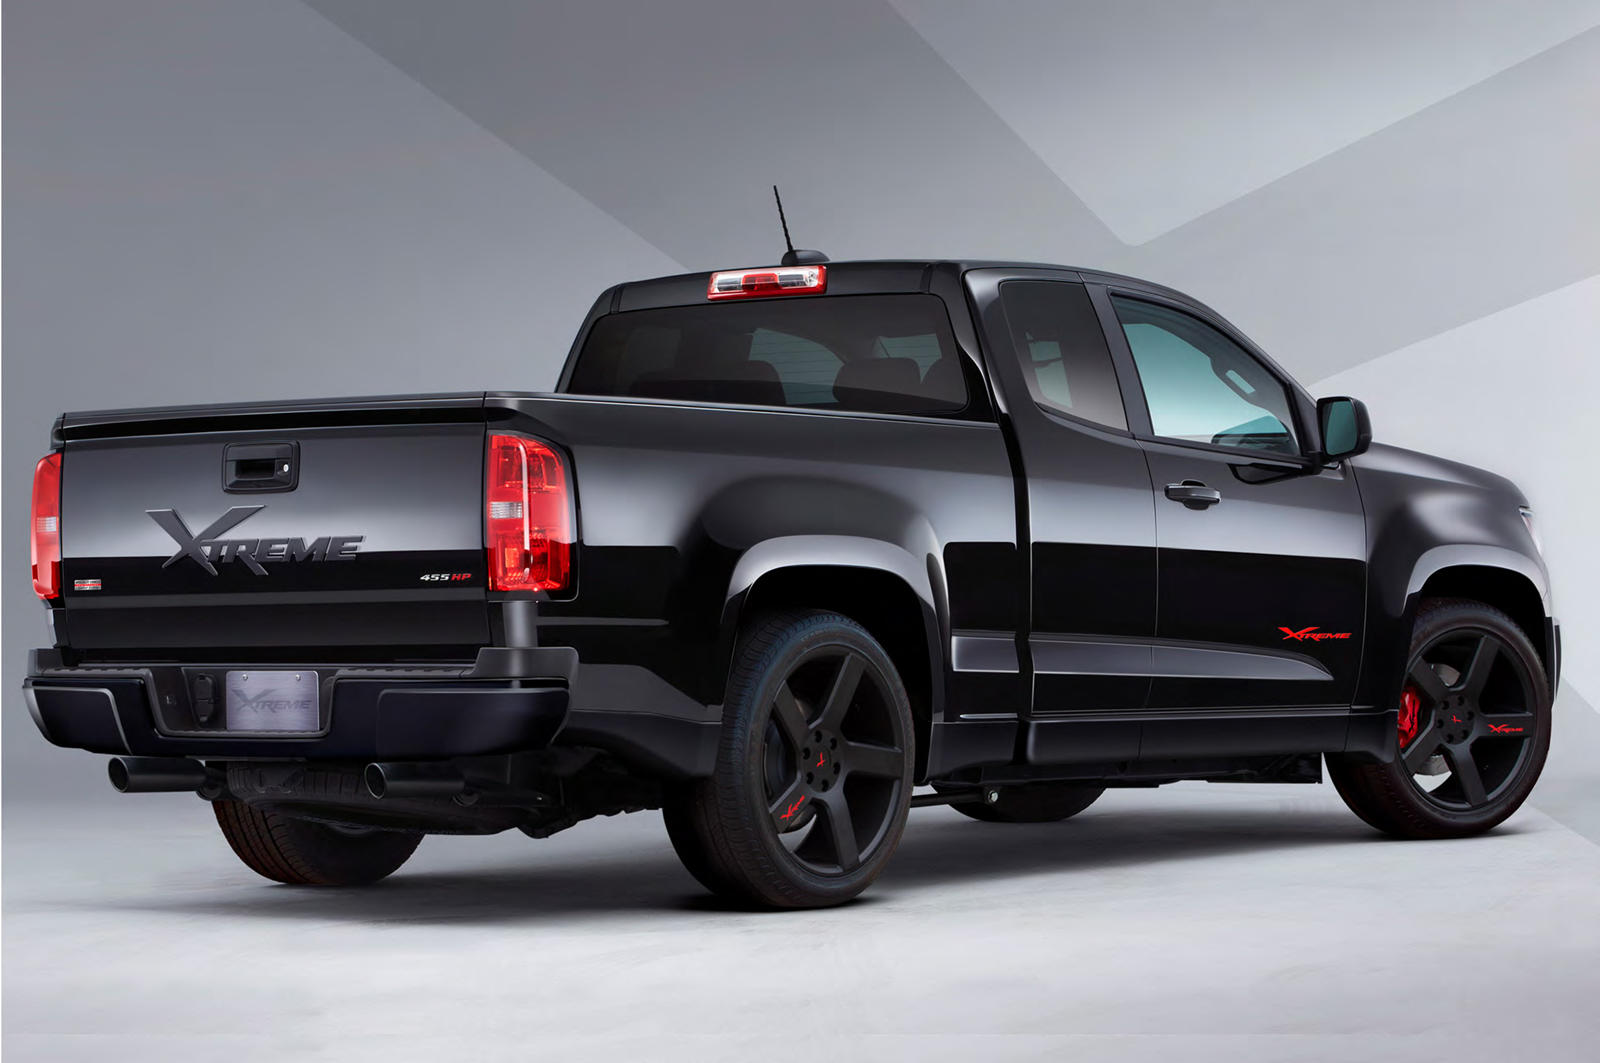 2020 SVE Colorado Xtreme: 455 HP Sport Truck